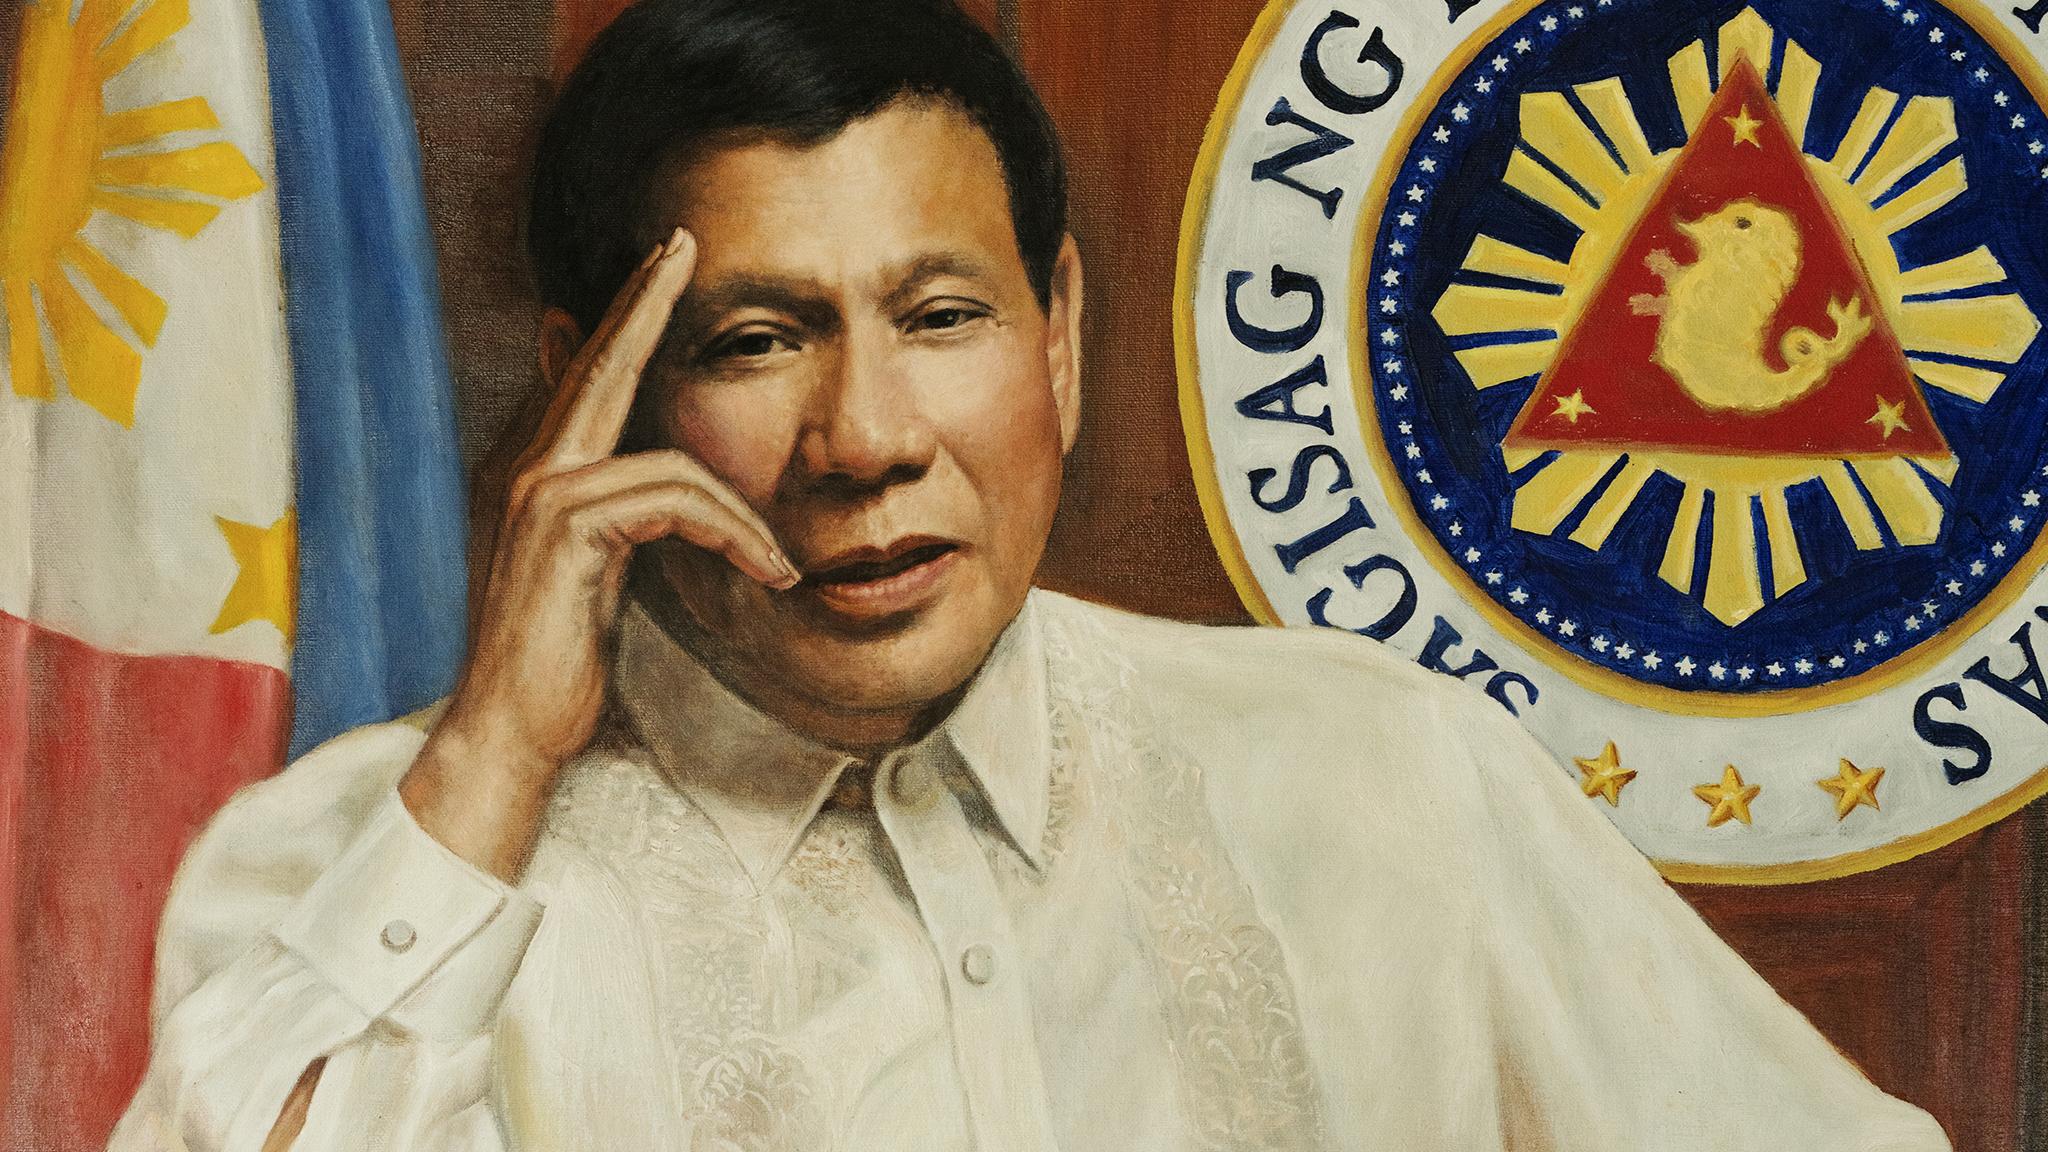 Drugs and death in Davao the making of Rodrigo Duterte 2048x1152